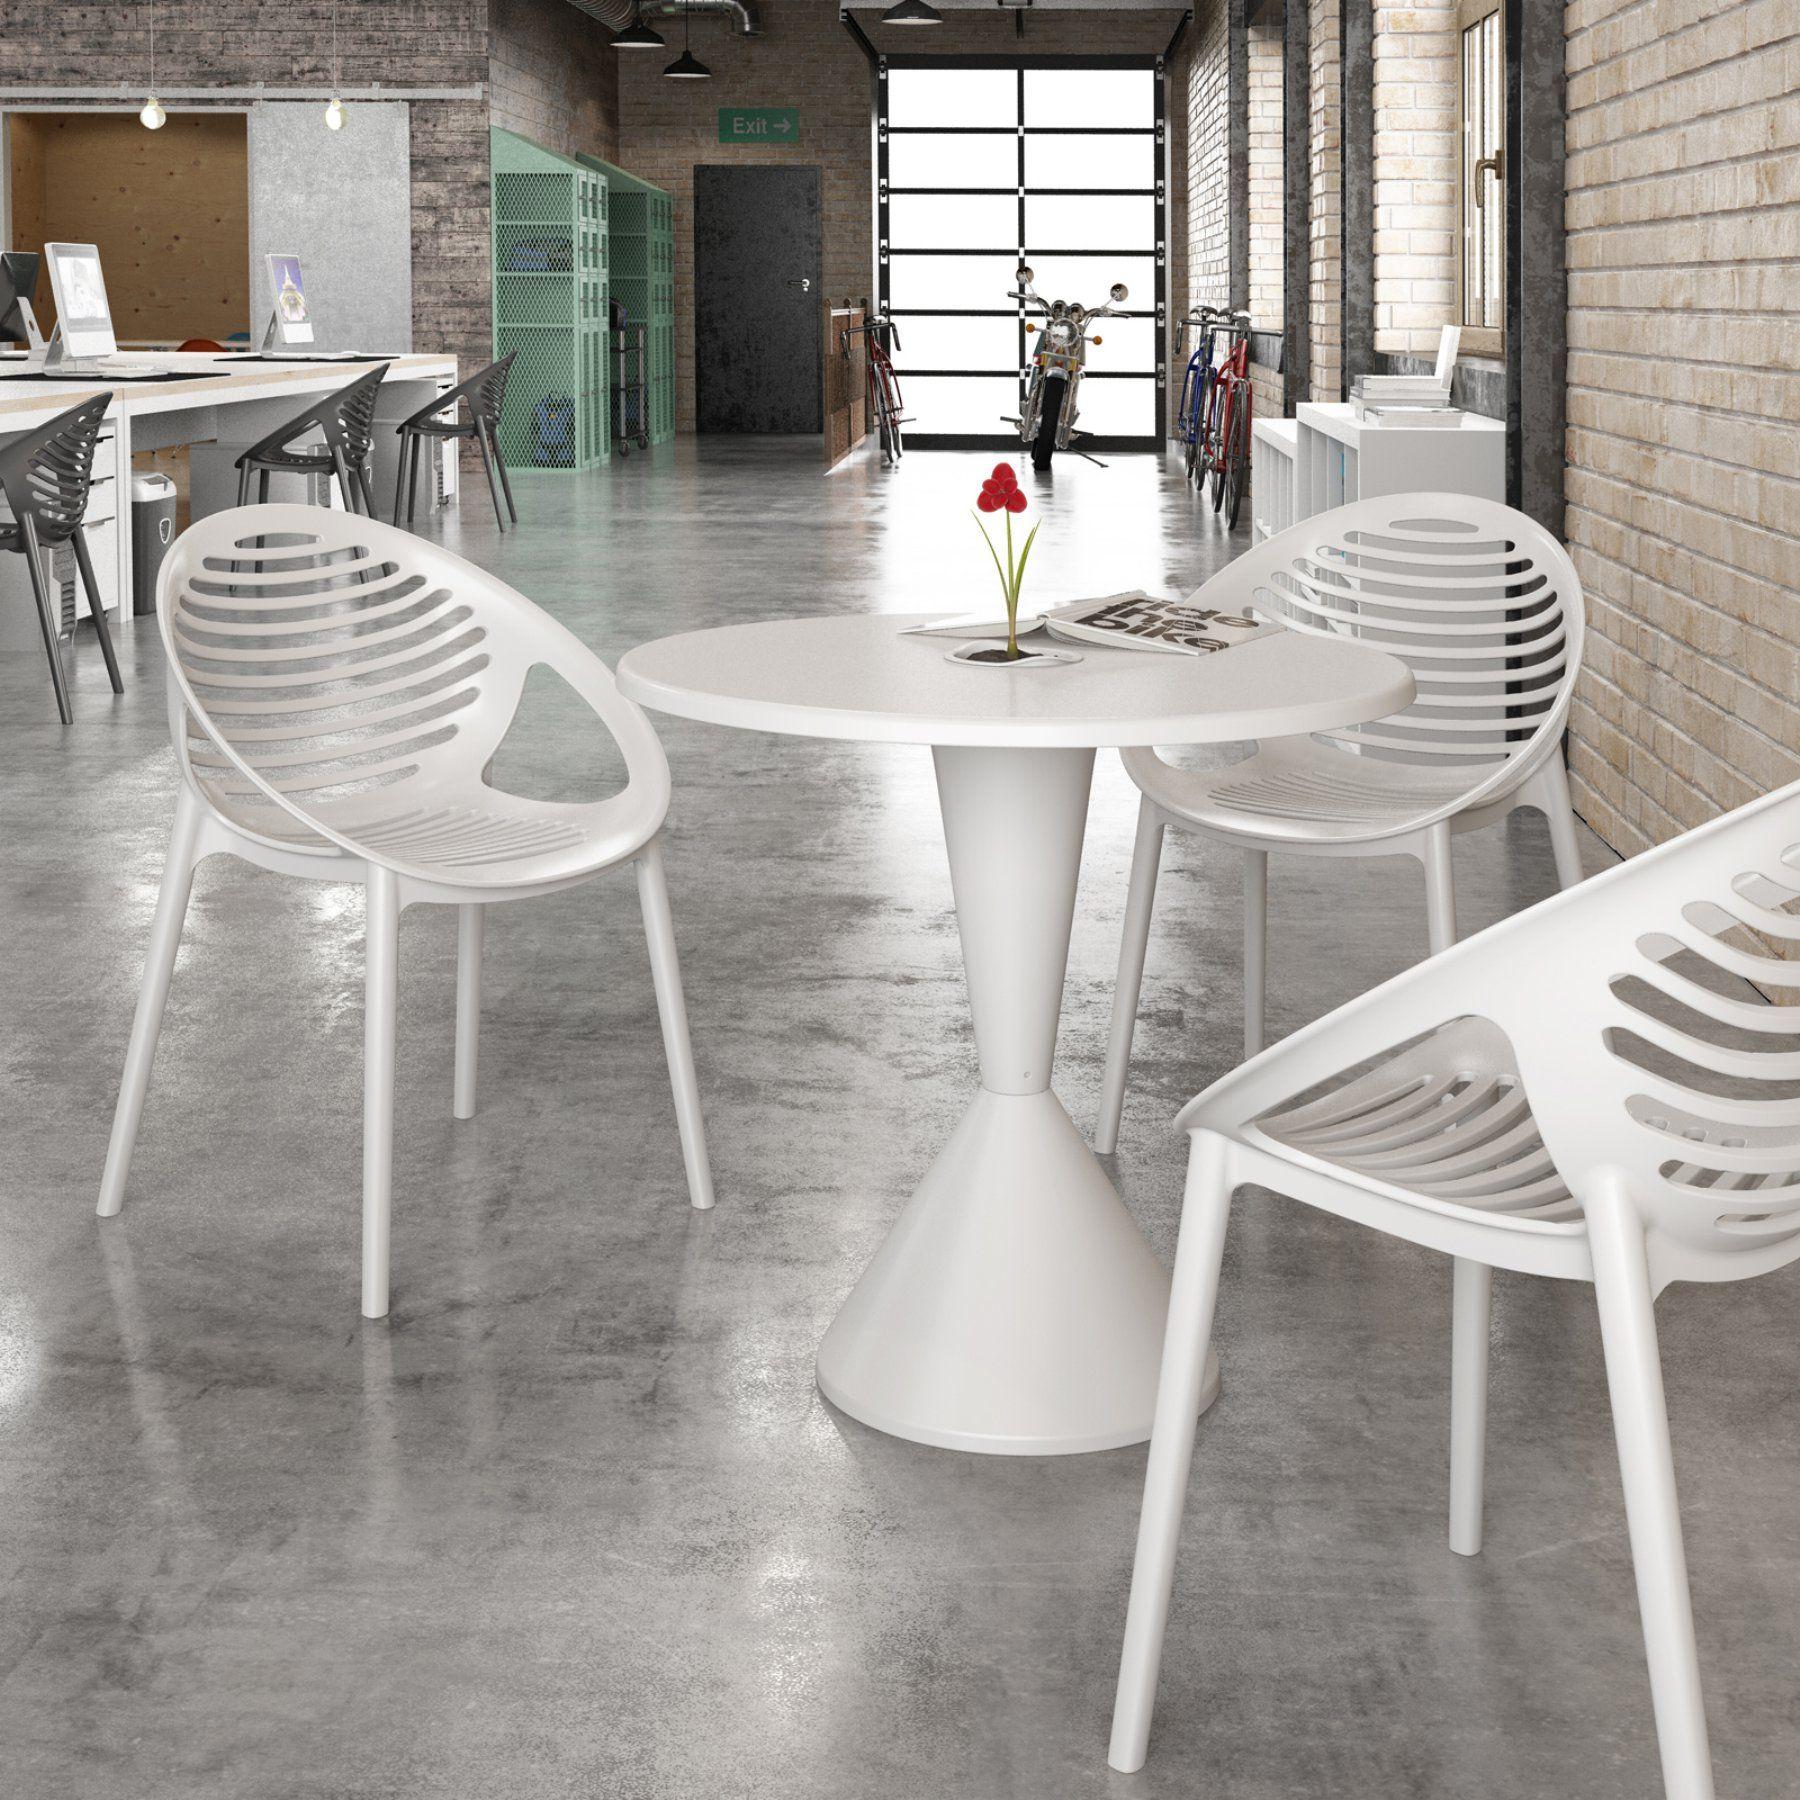 Diamond Sofa Expo Indoor Outdoor 31 In Round Bistro Table Expodtwh